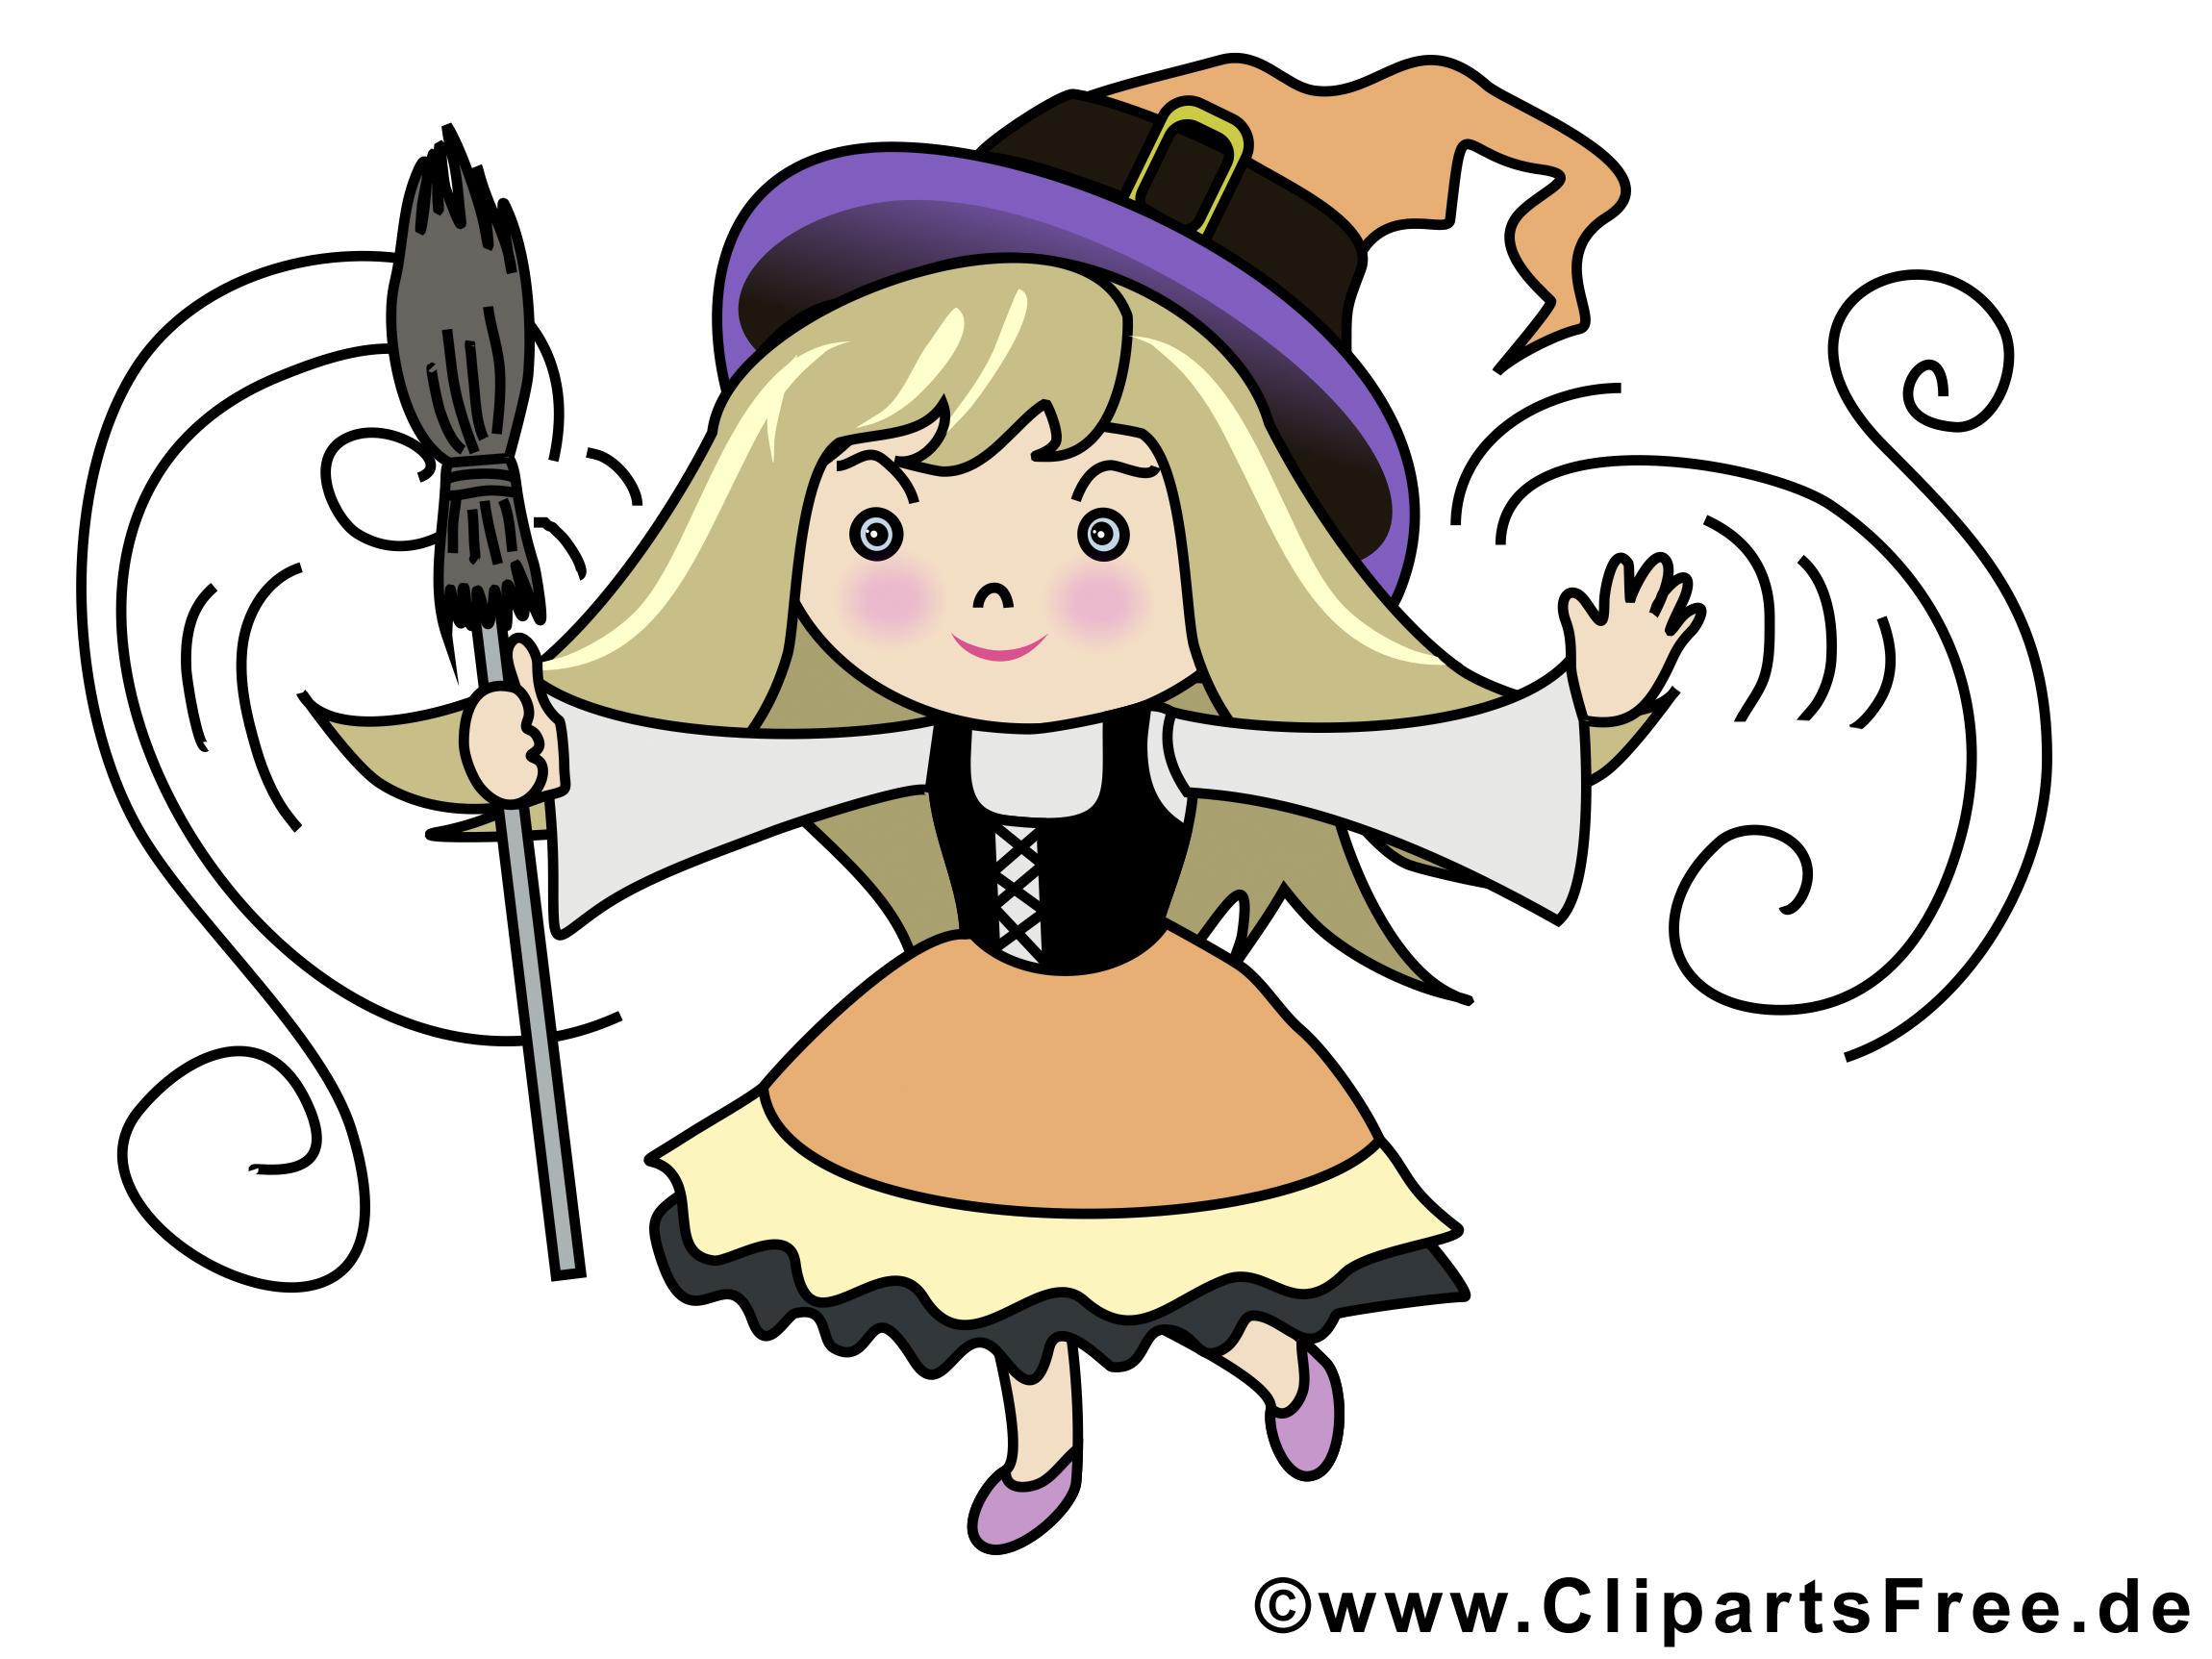 Sorcière illustration - Halloween images